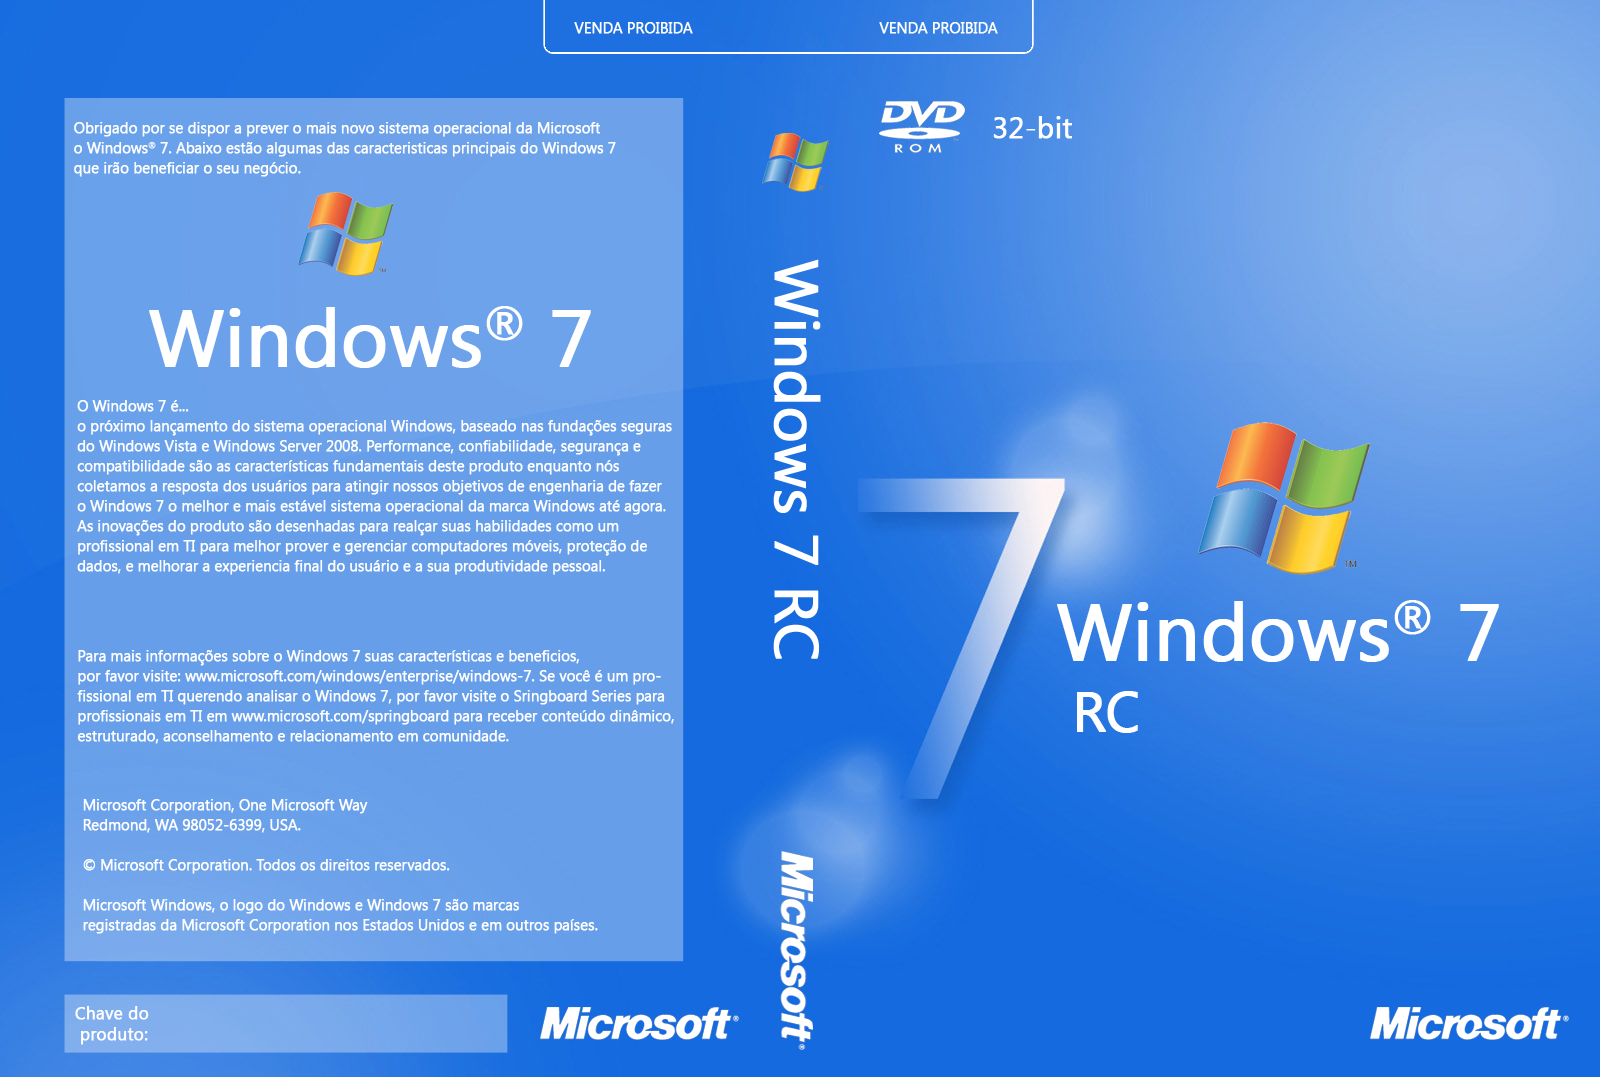 windows 7 rc 7100 cover cd br by genesman on deviantart. Black Bedroom Furniture Sets. Home Design Ideas